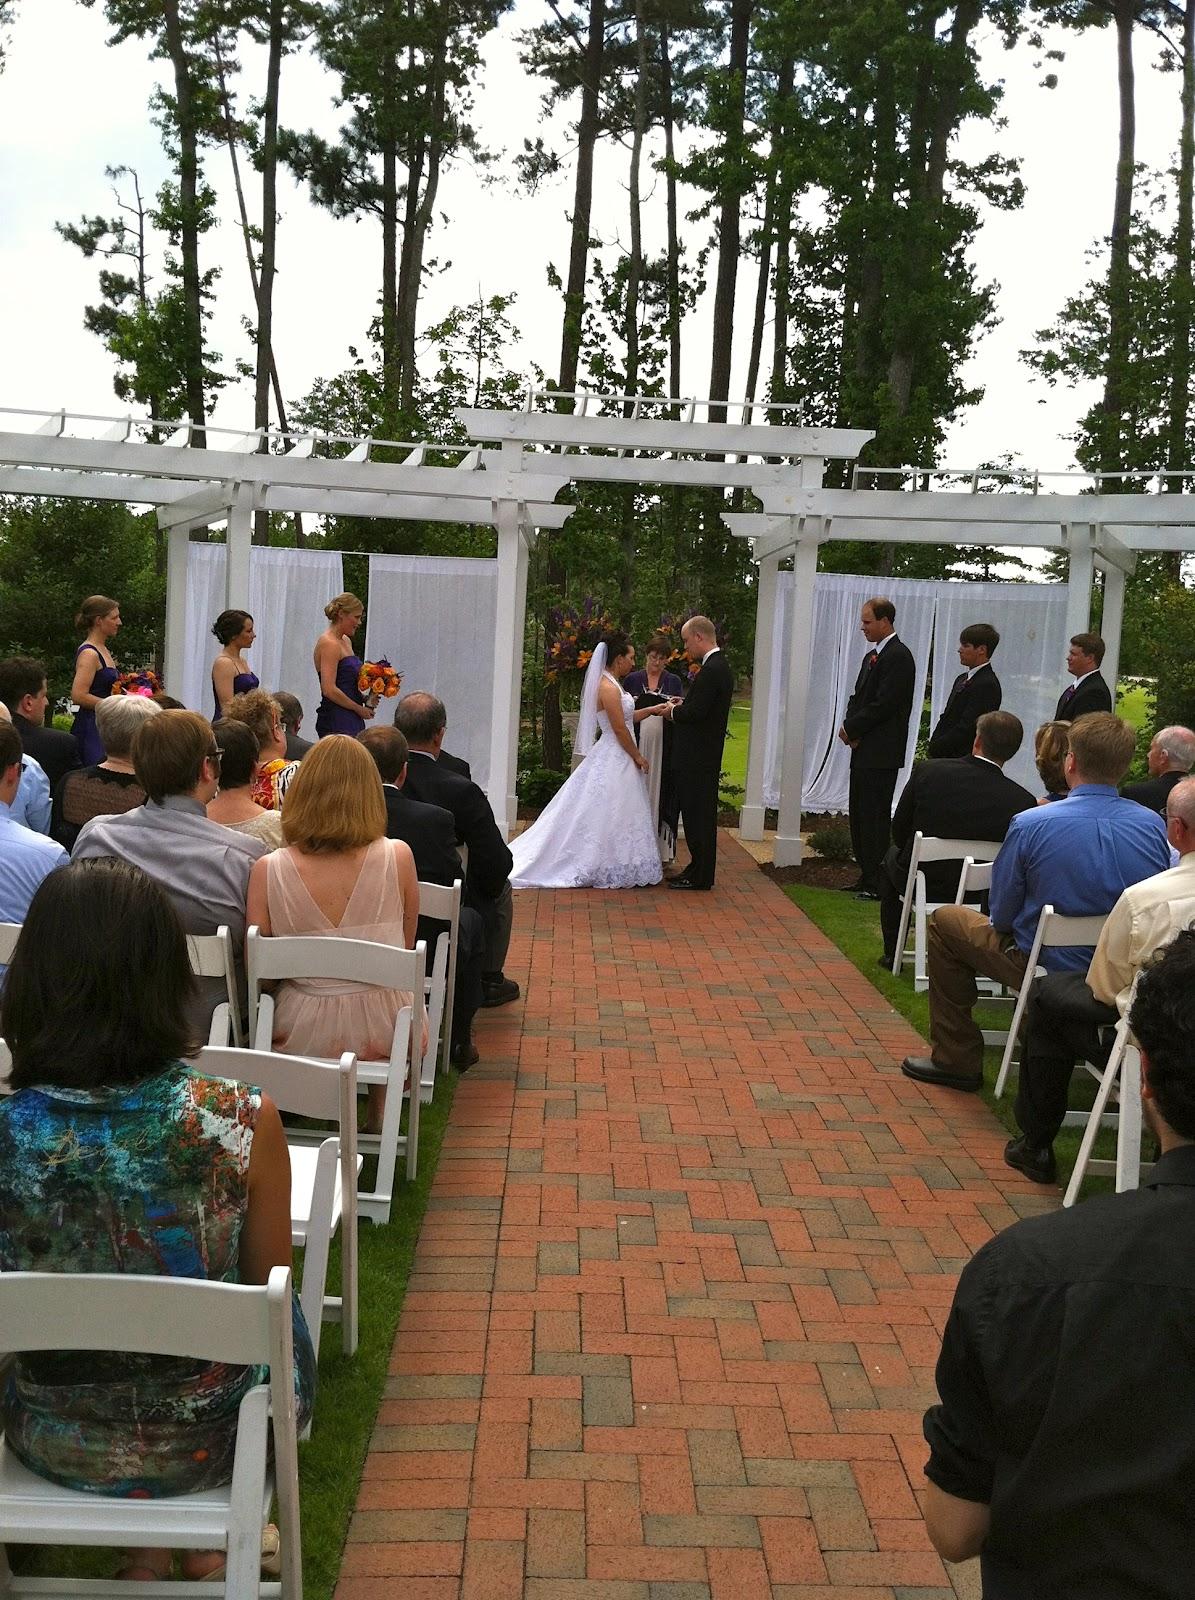 Raleigh Wedding Blog: Wedding Bells Ring for Amanda and TJ at Brier ...